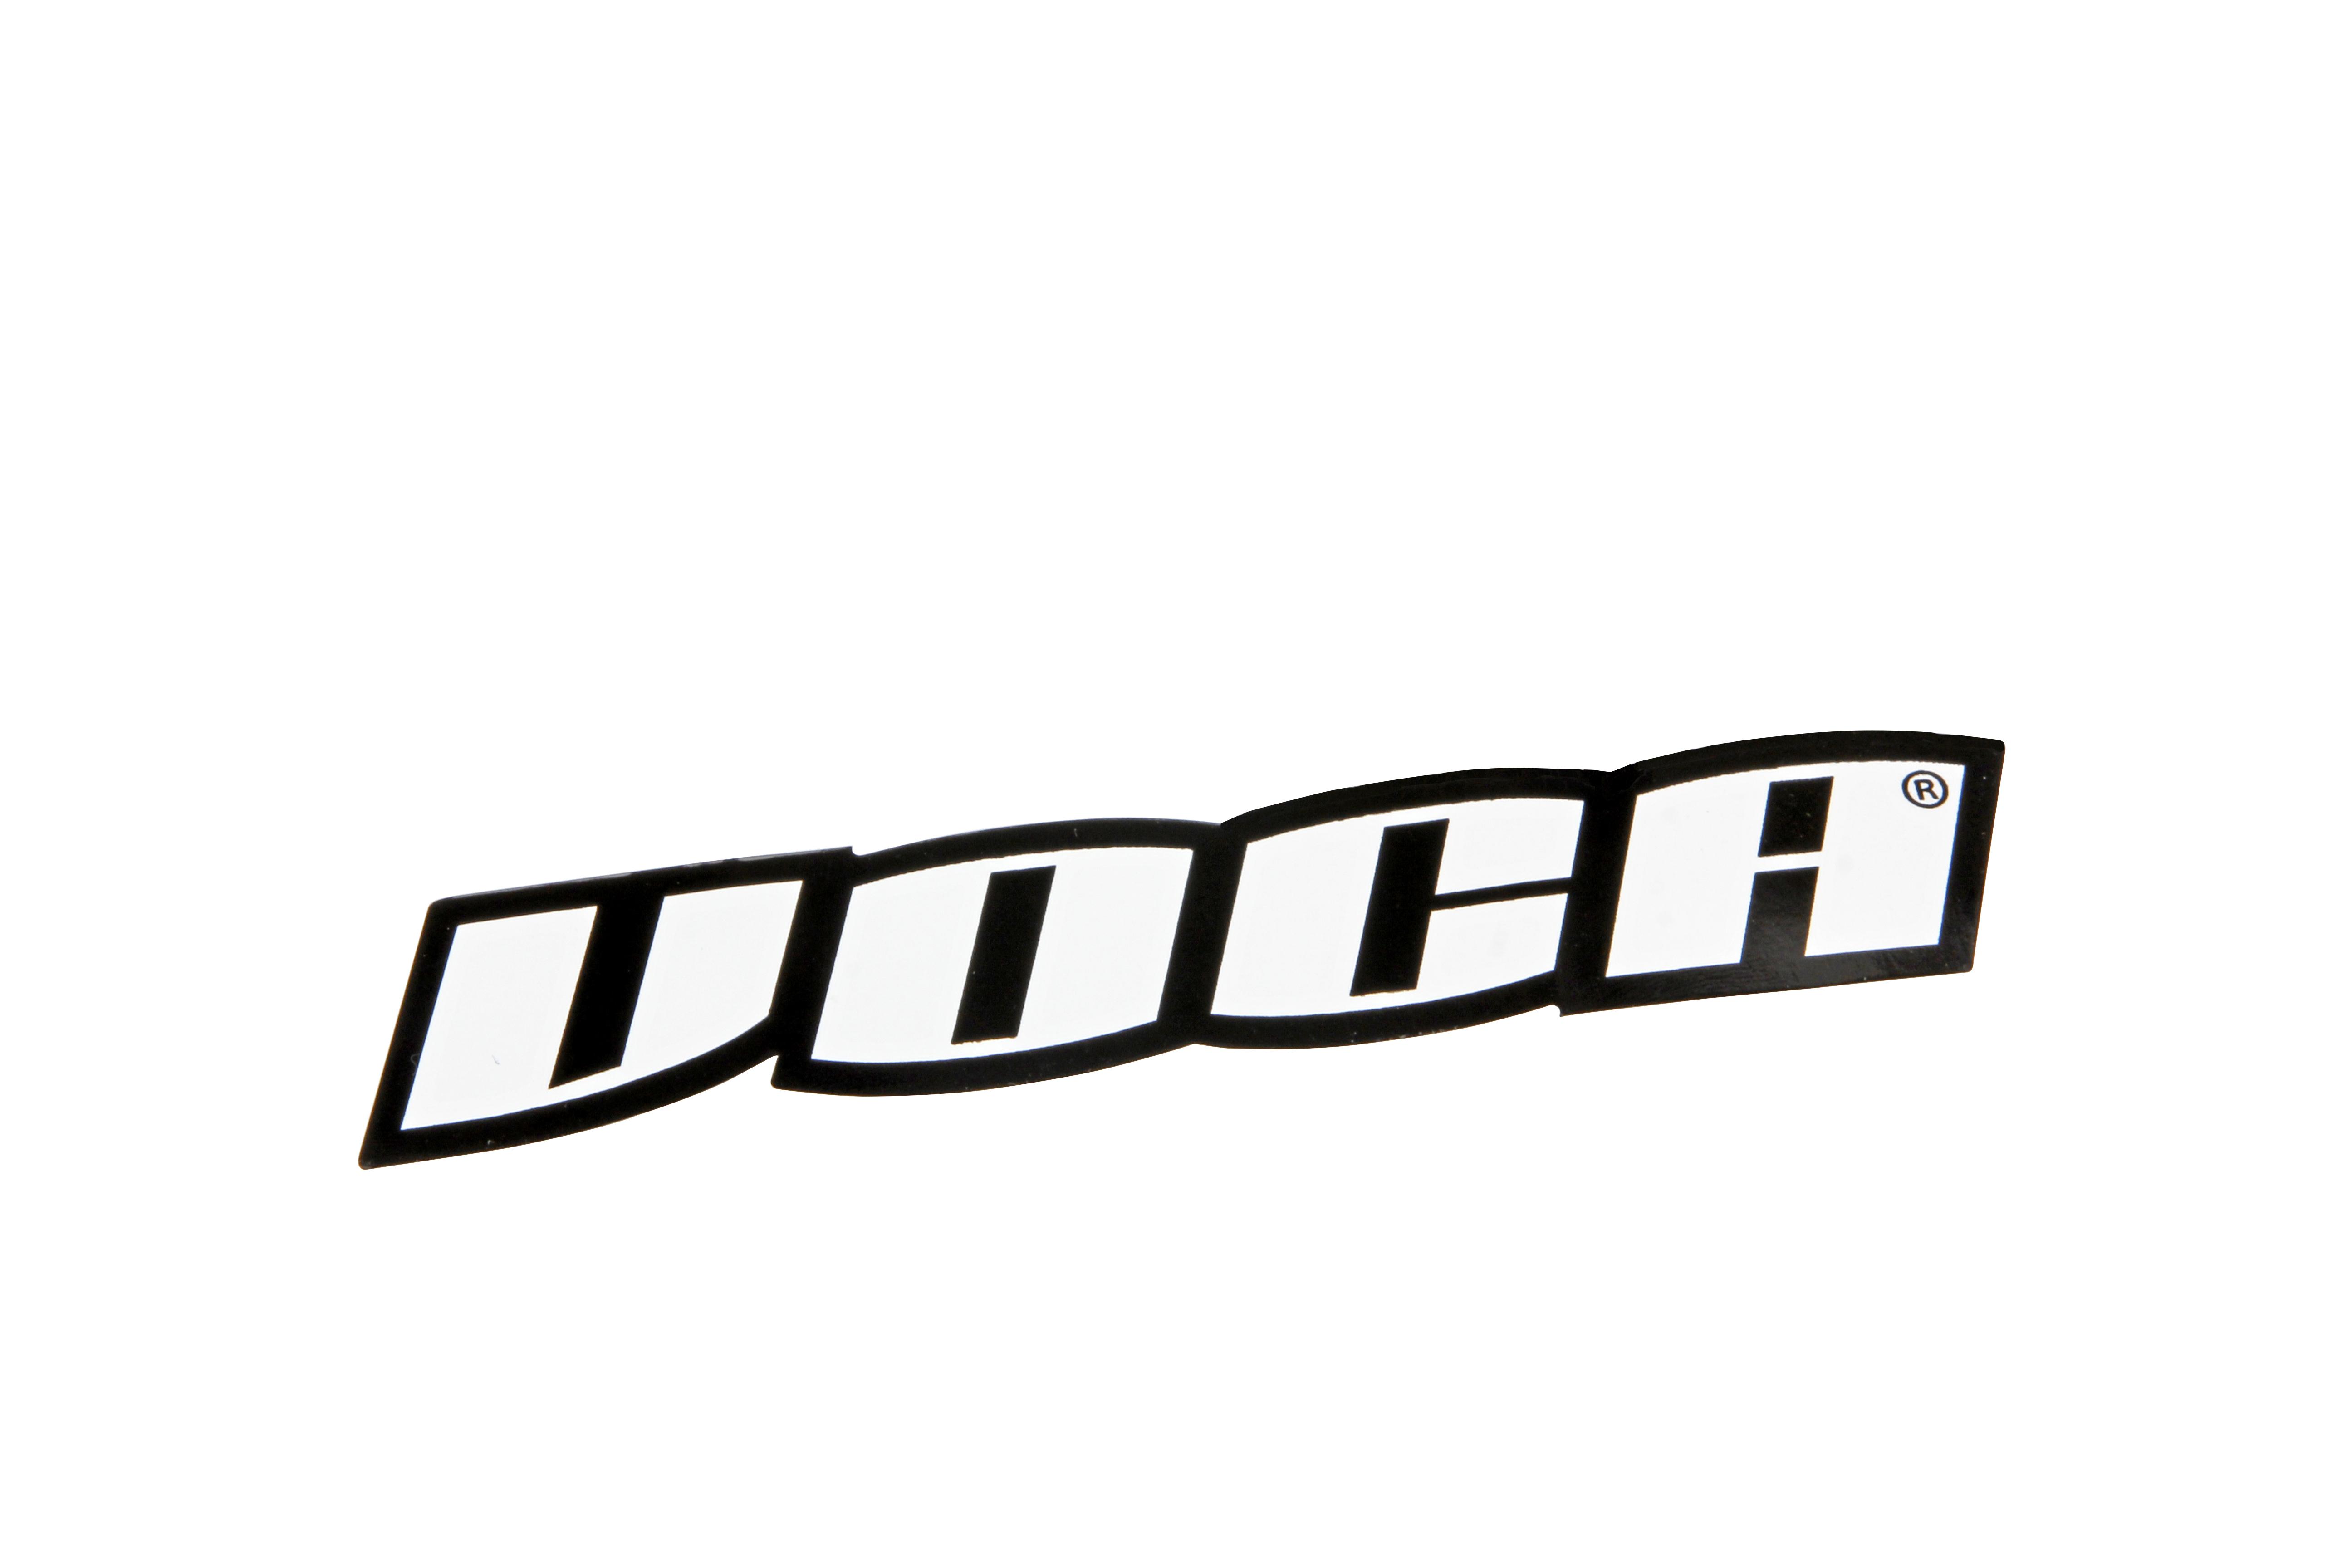 VCR-MD0200_vector_claro - VocaRacing